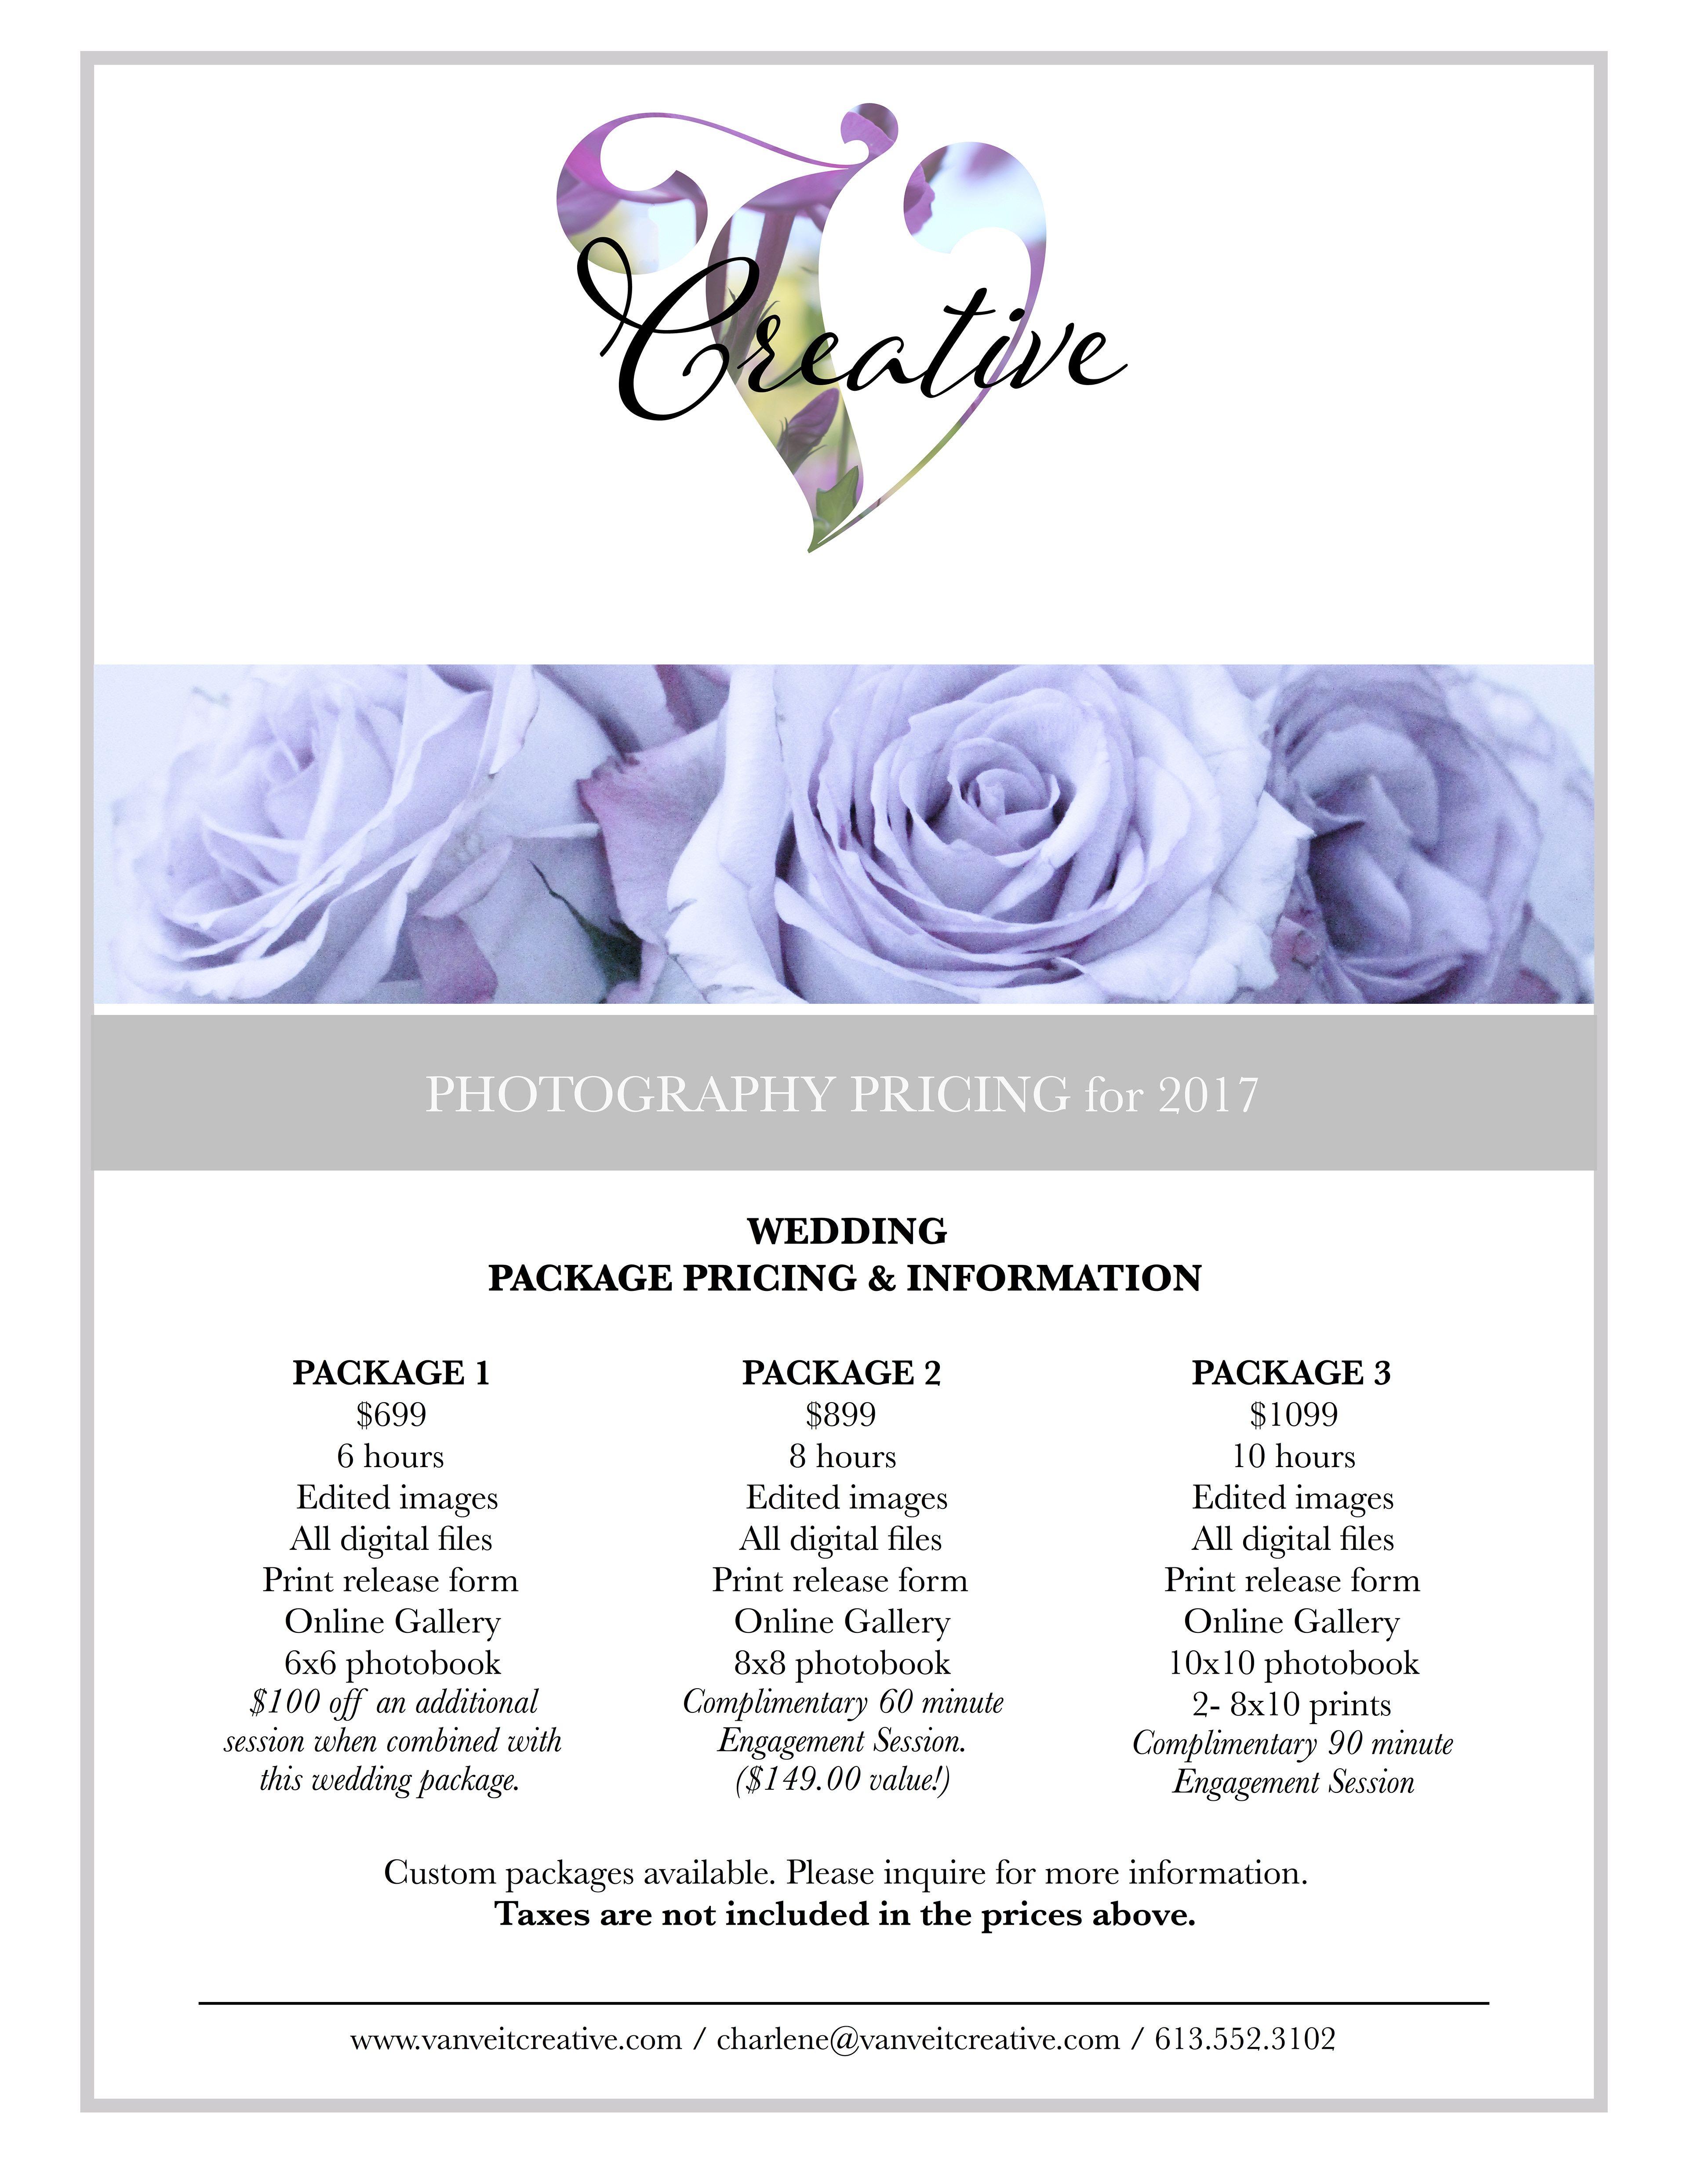 Wedding Photography Pricing Templates Van Veit Creative Wedding Photography Pricing Photography Pricing Wedding Photography Tips